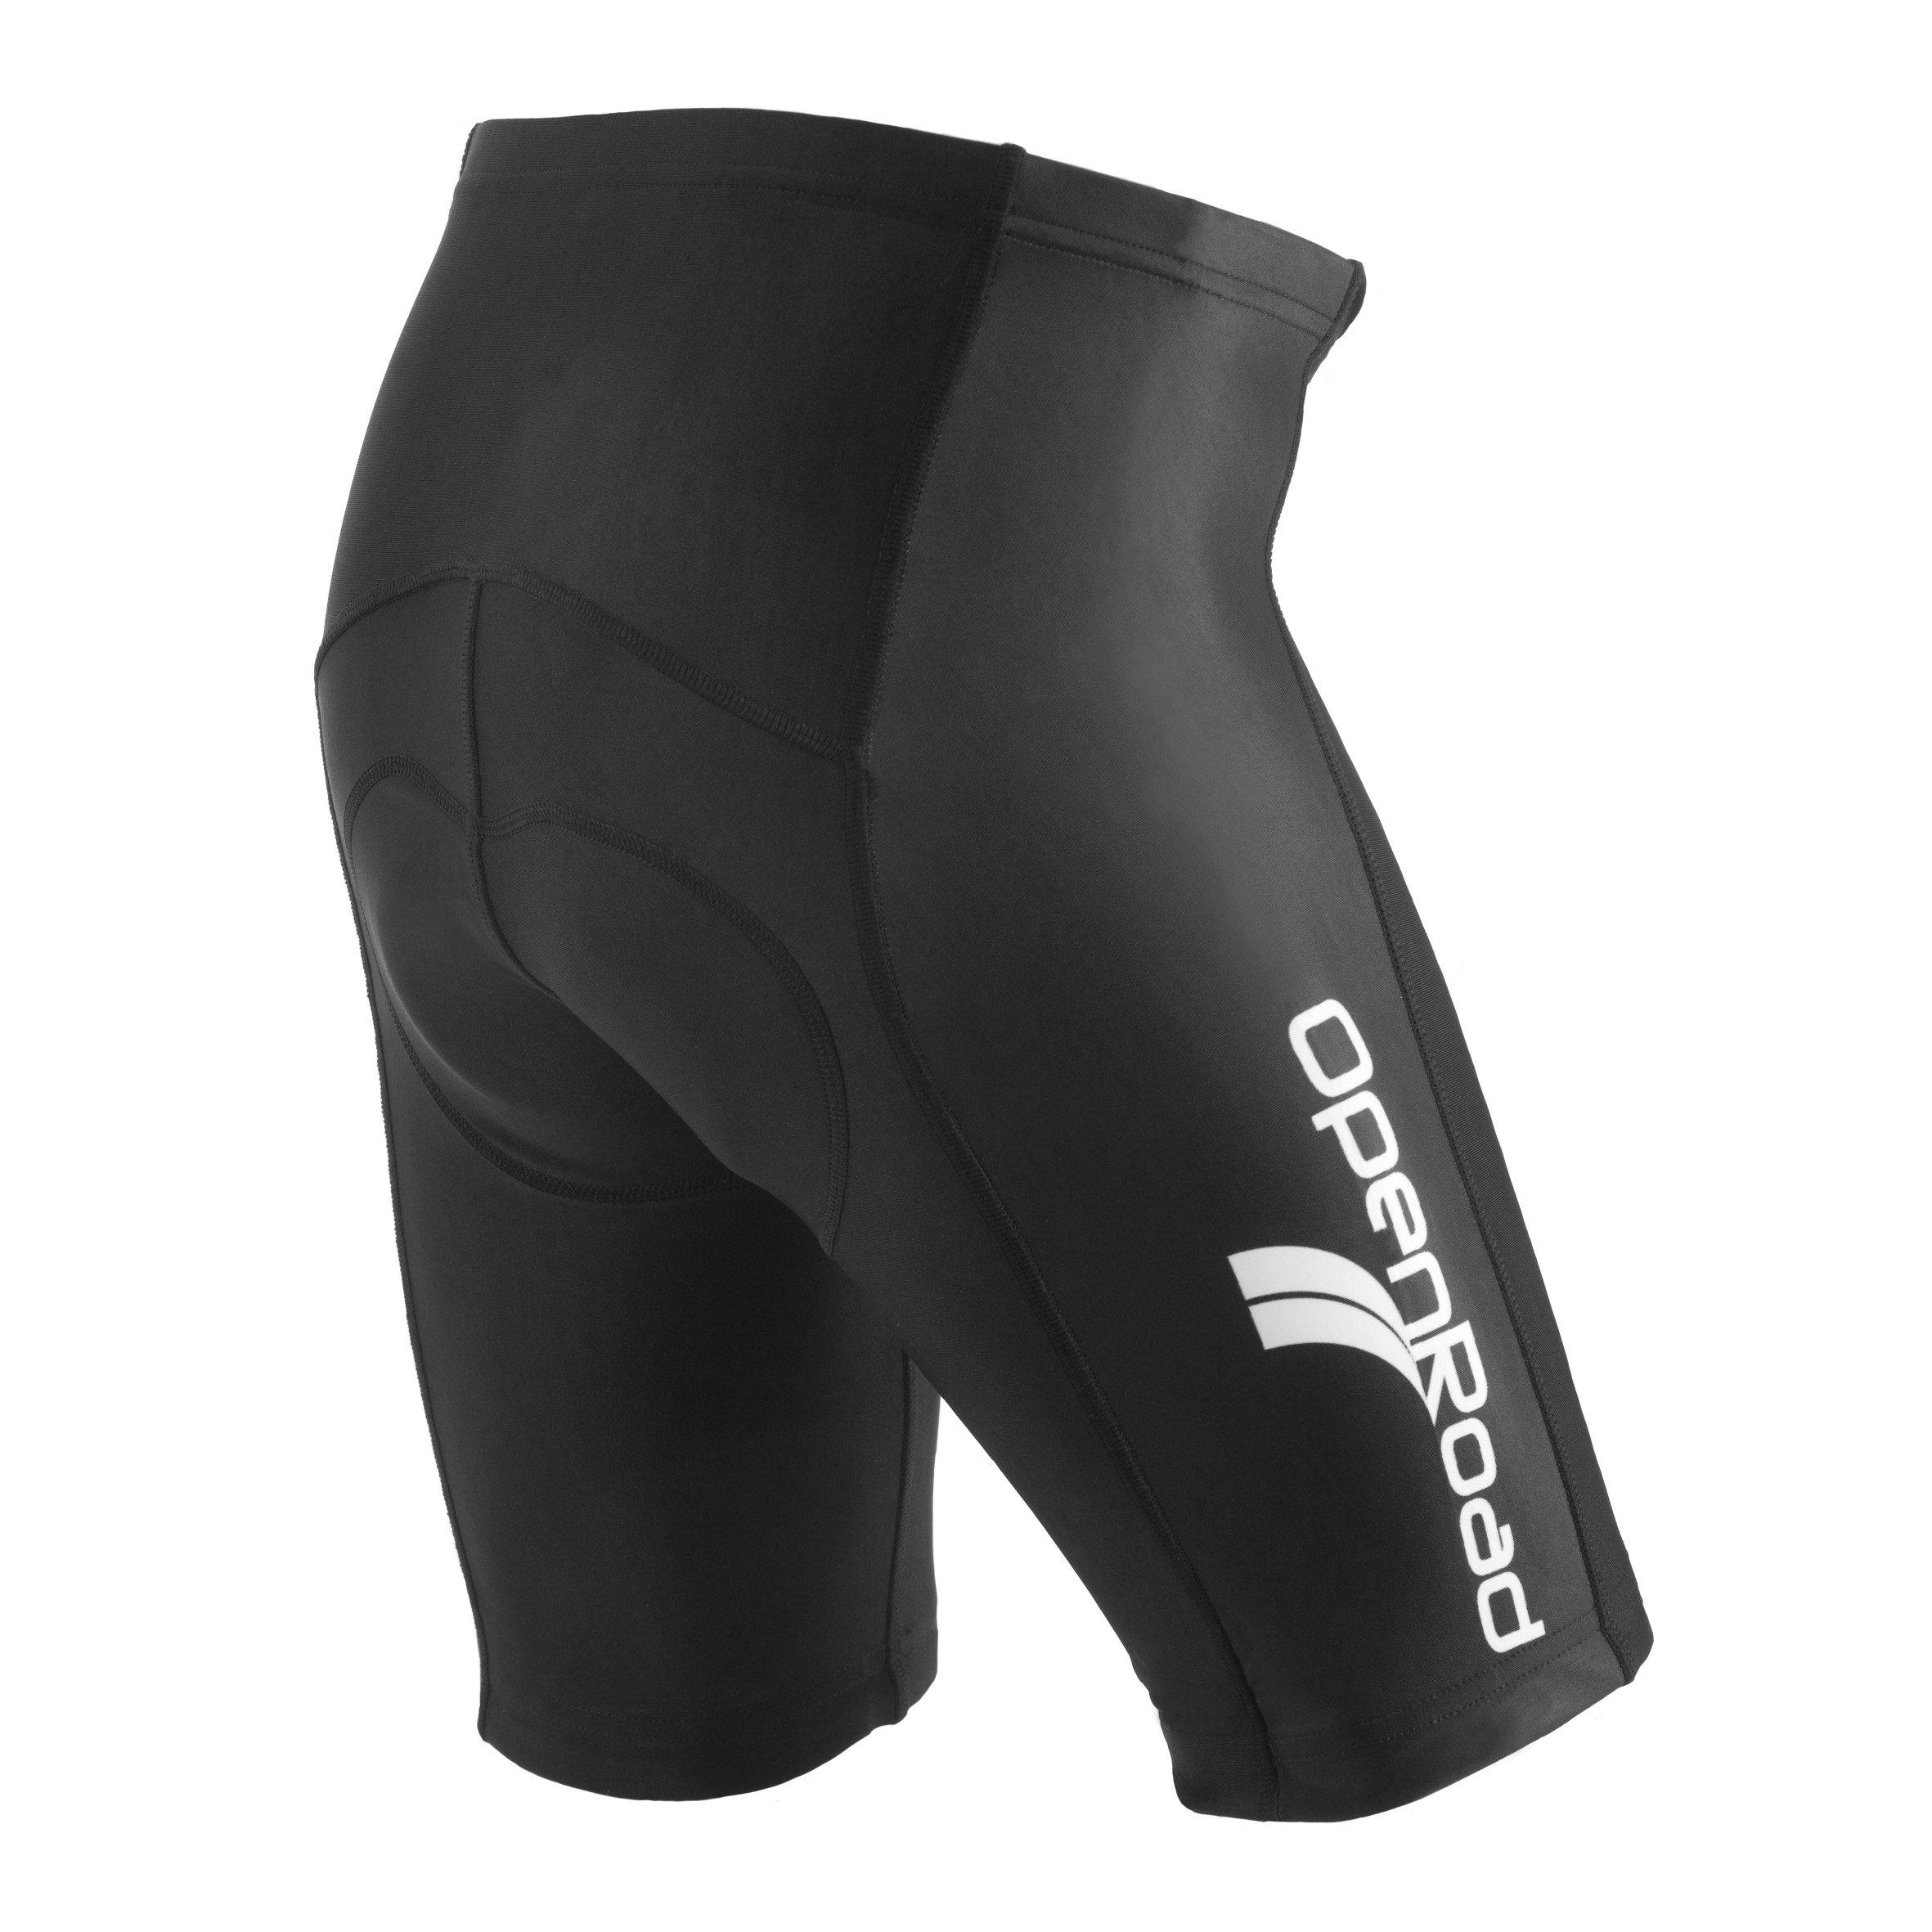 f3c2495ab1e4 OpenRoad Gel Mens Imbottiti Pantaloncini da Ciclista Bici della Strada  product image